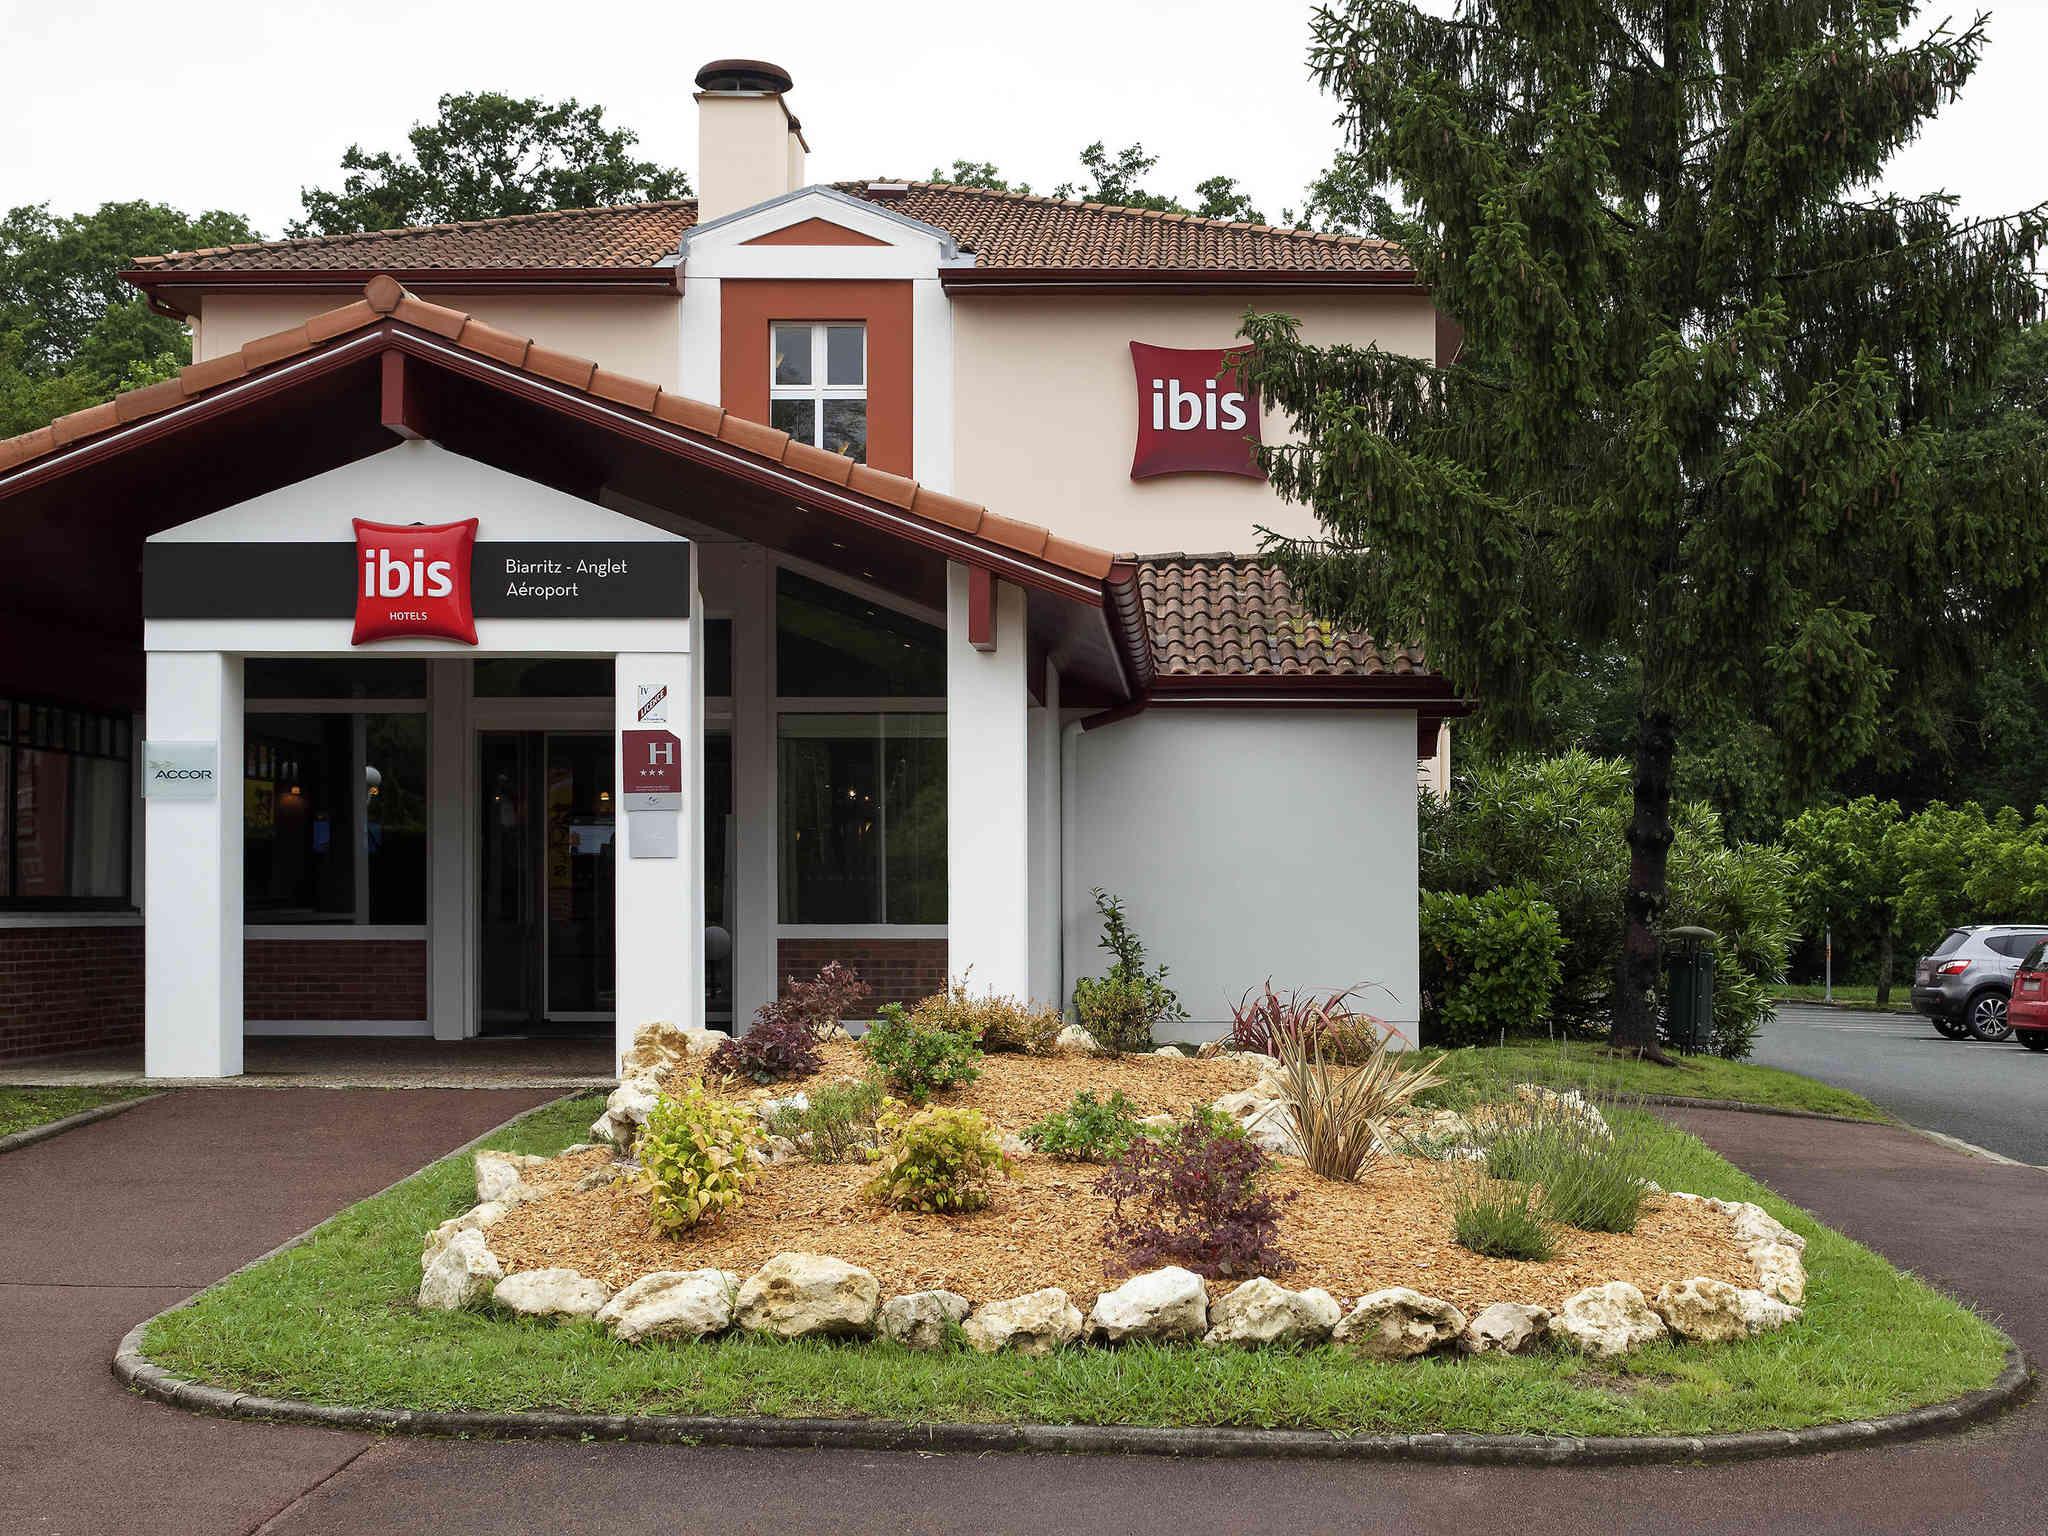 Hôtel - ibis Biarritz Anglet Aéroport